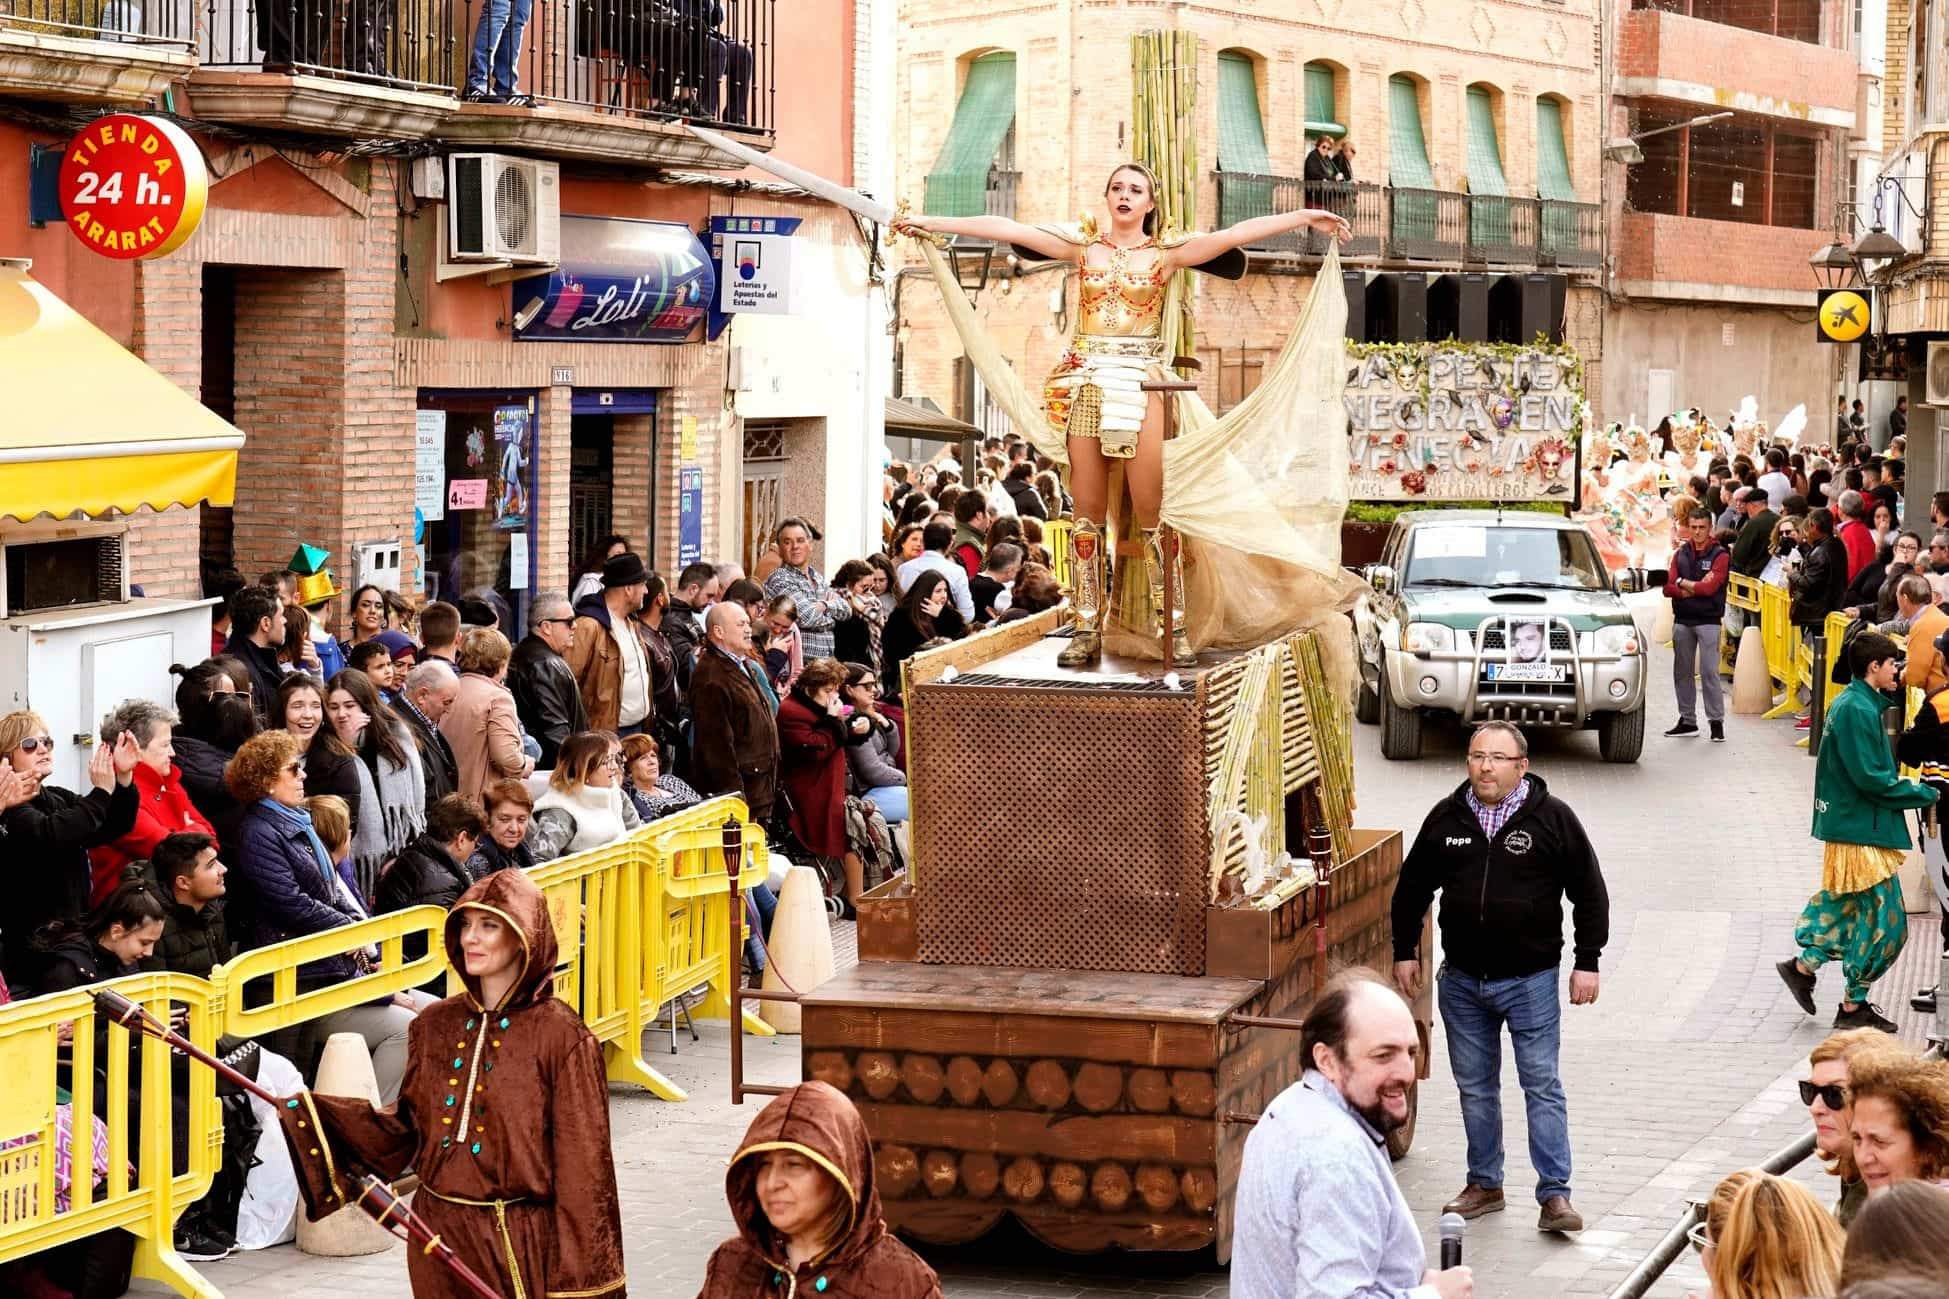 Carnaval de herencia 2020 ofertorio 52 - Selección de fotografías del Ofertorio del Carnaval de Herencia